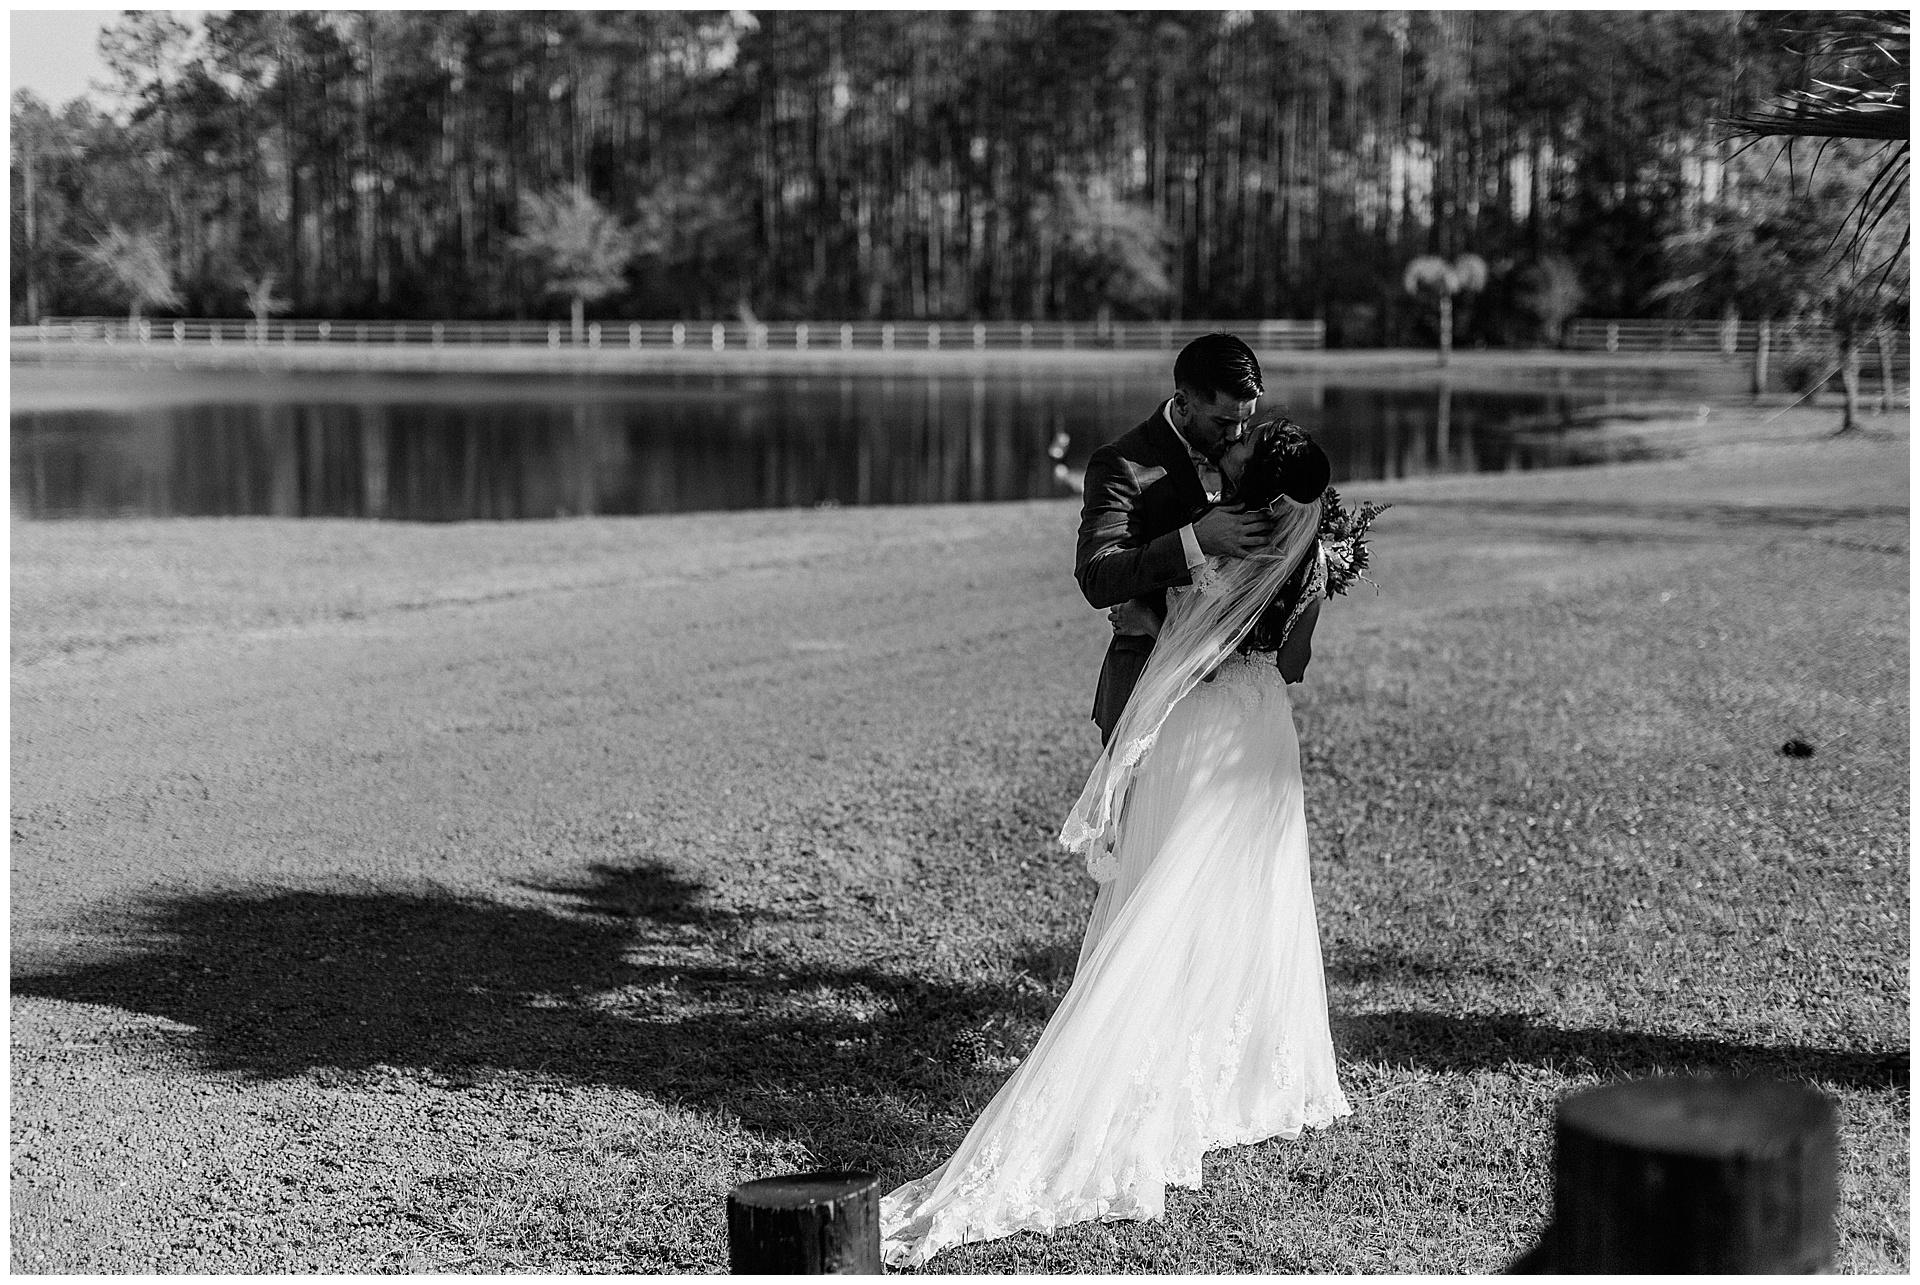 st augustine wedding photographer_mia dimare photography30.jpg